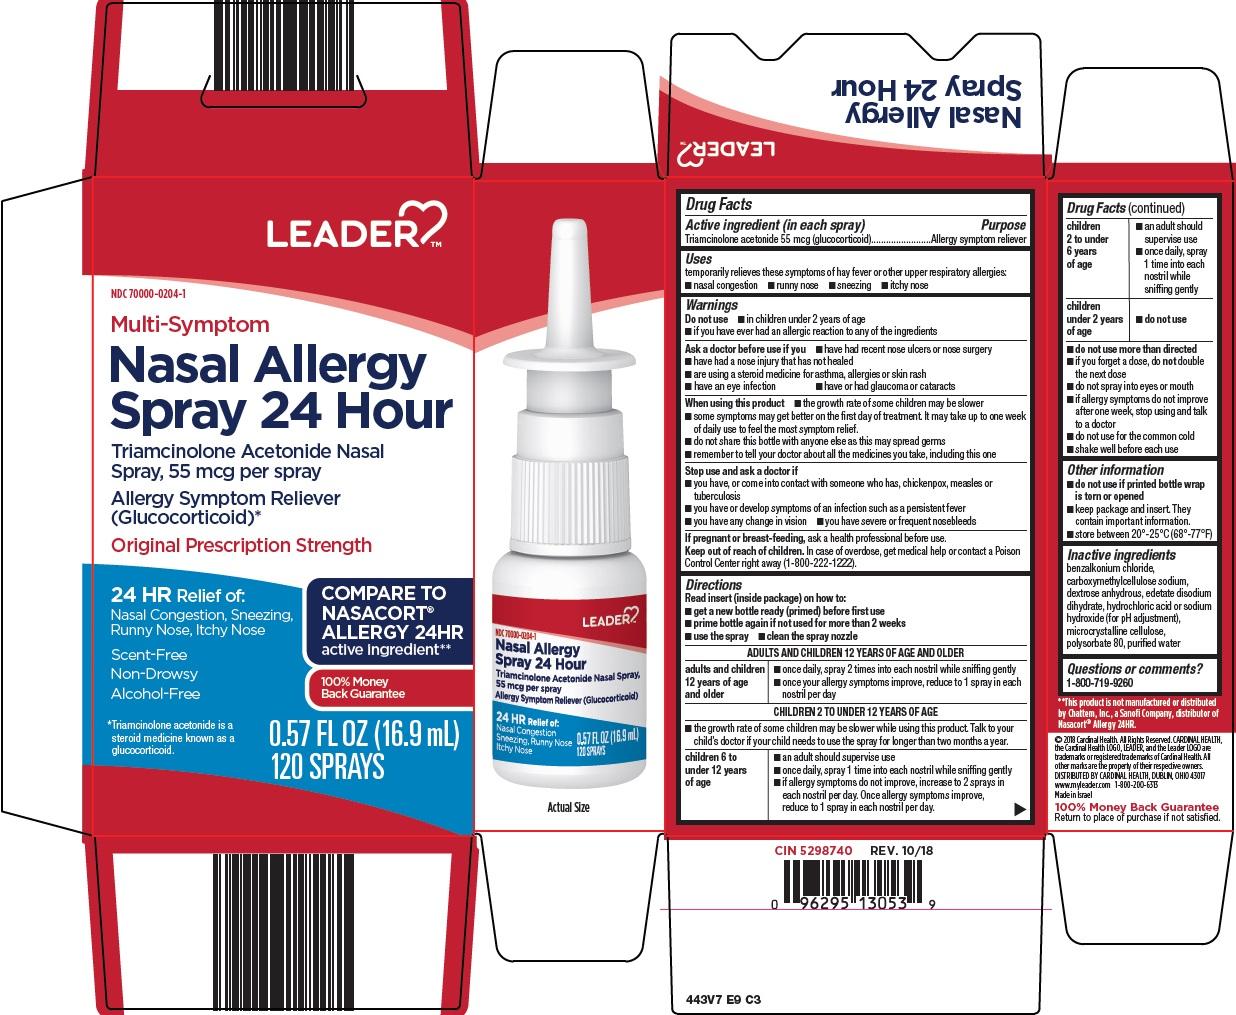 443-e9-nasal-allergy-spray-24-hour.jpg